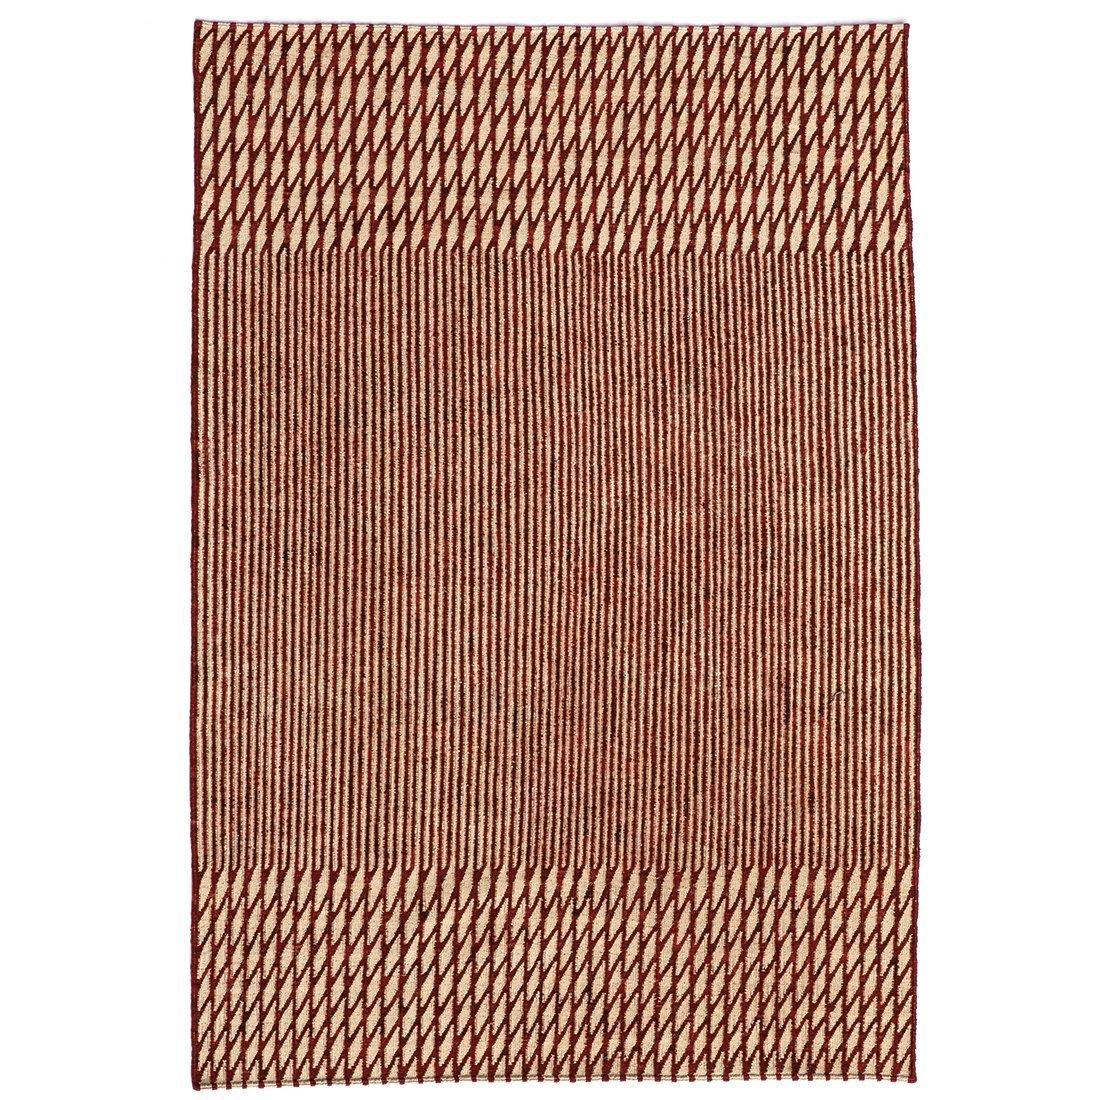 Nanimarquina Blur Vloerkleed Rood - 300 x 200 cm.